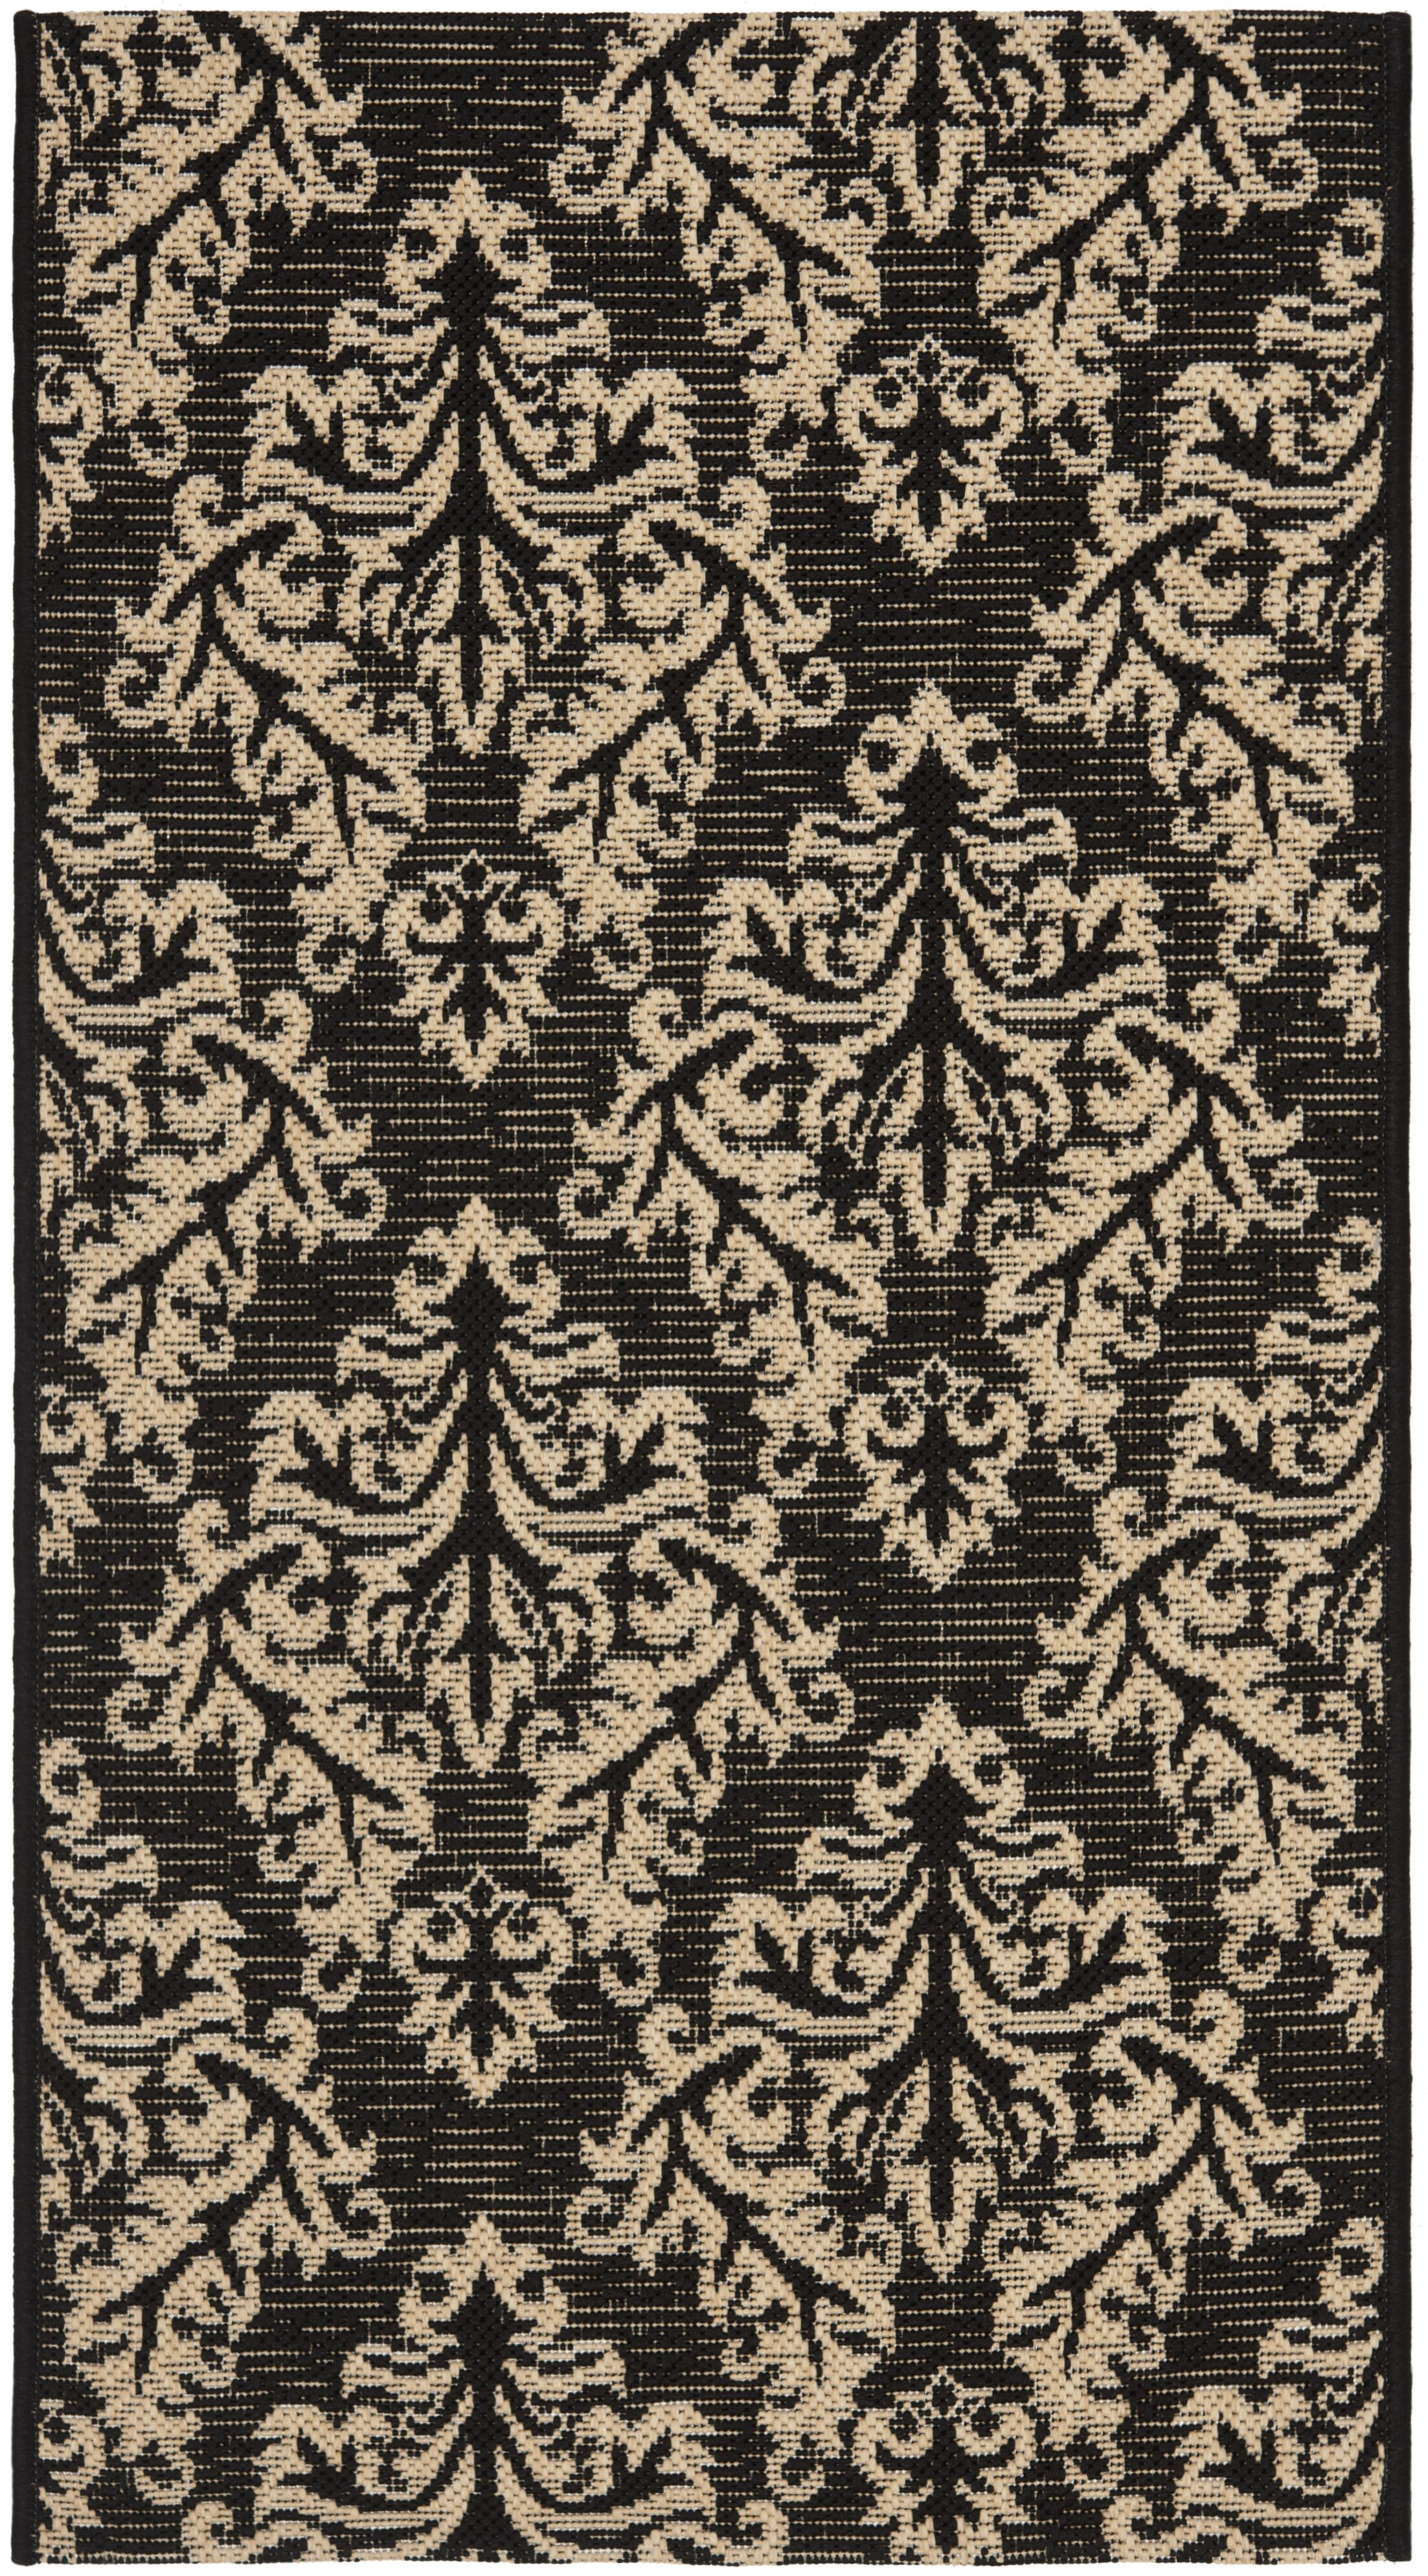 Octavius Black/Cream Indoor/Outdoor Area Rug Rug Size: Rectangle 9' x 12'6